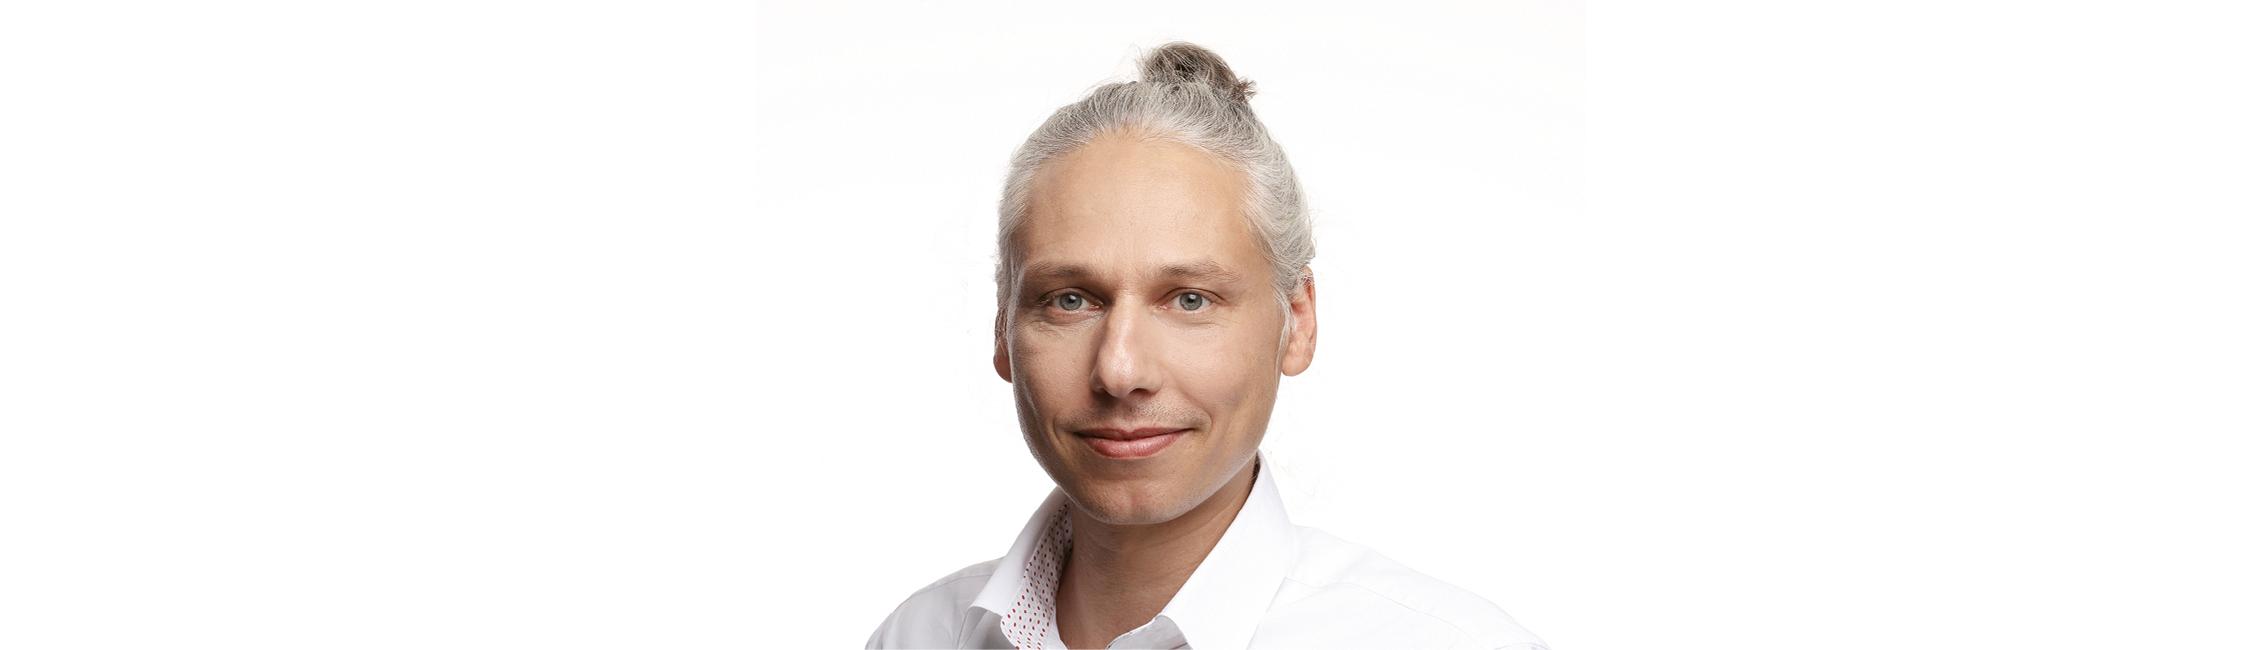 Štítek: Jiří Kadeřávek